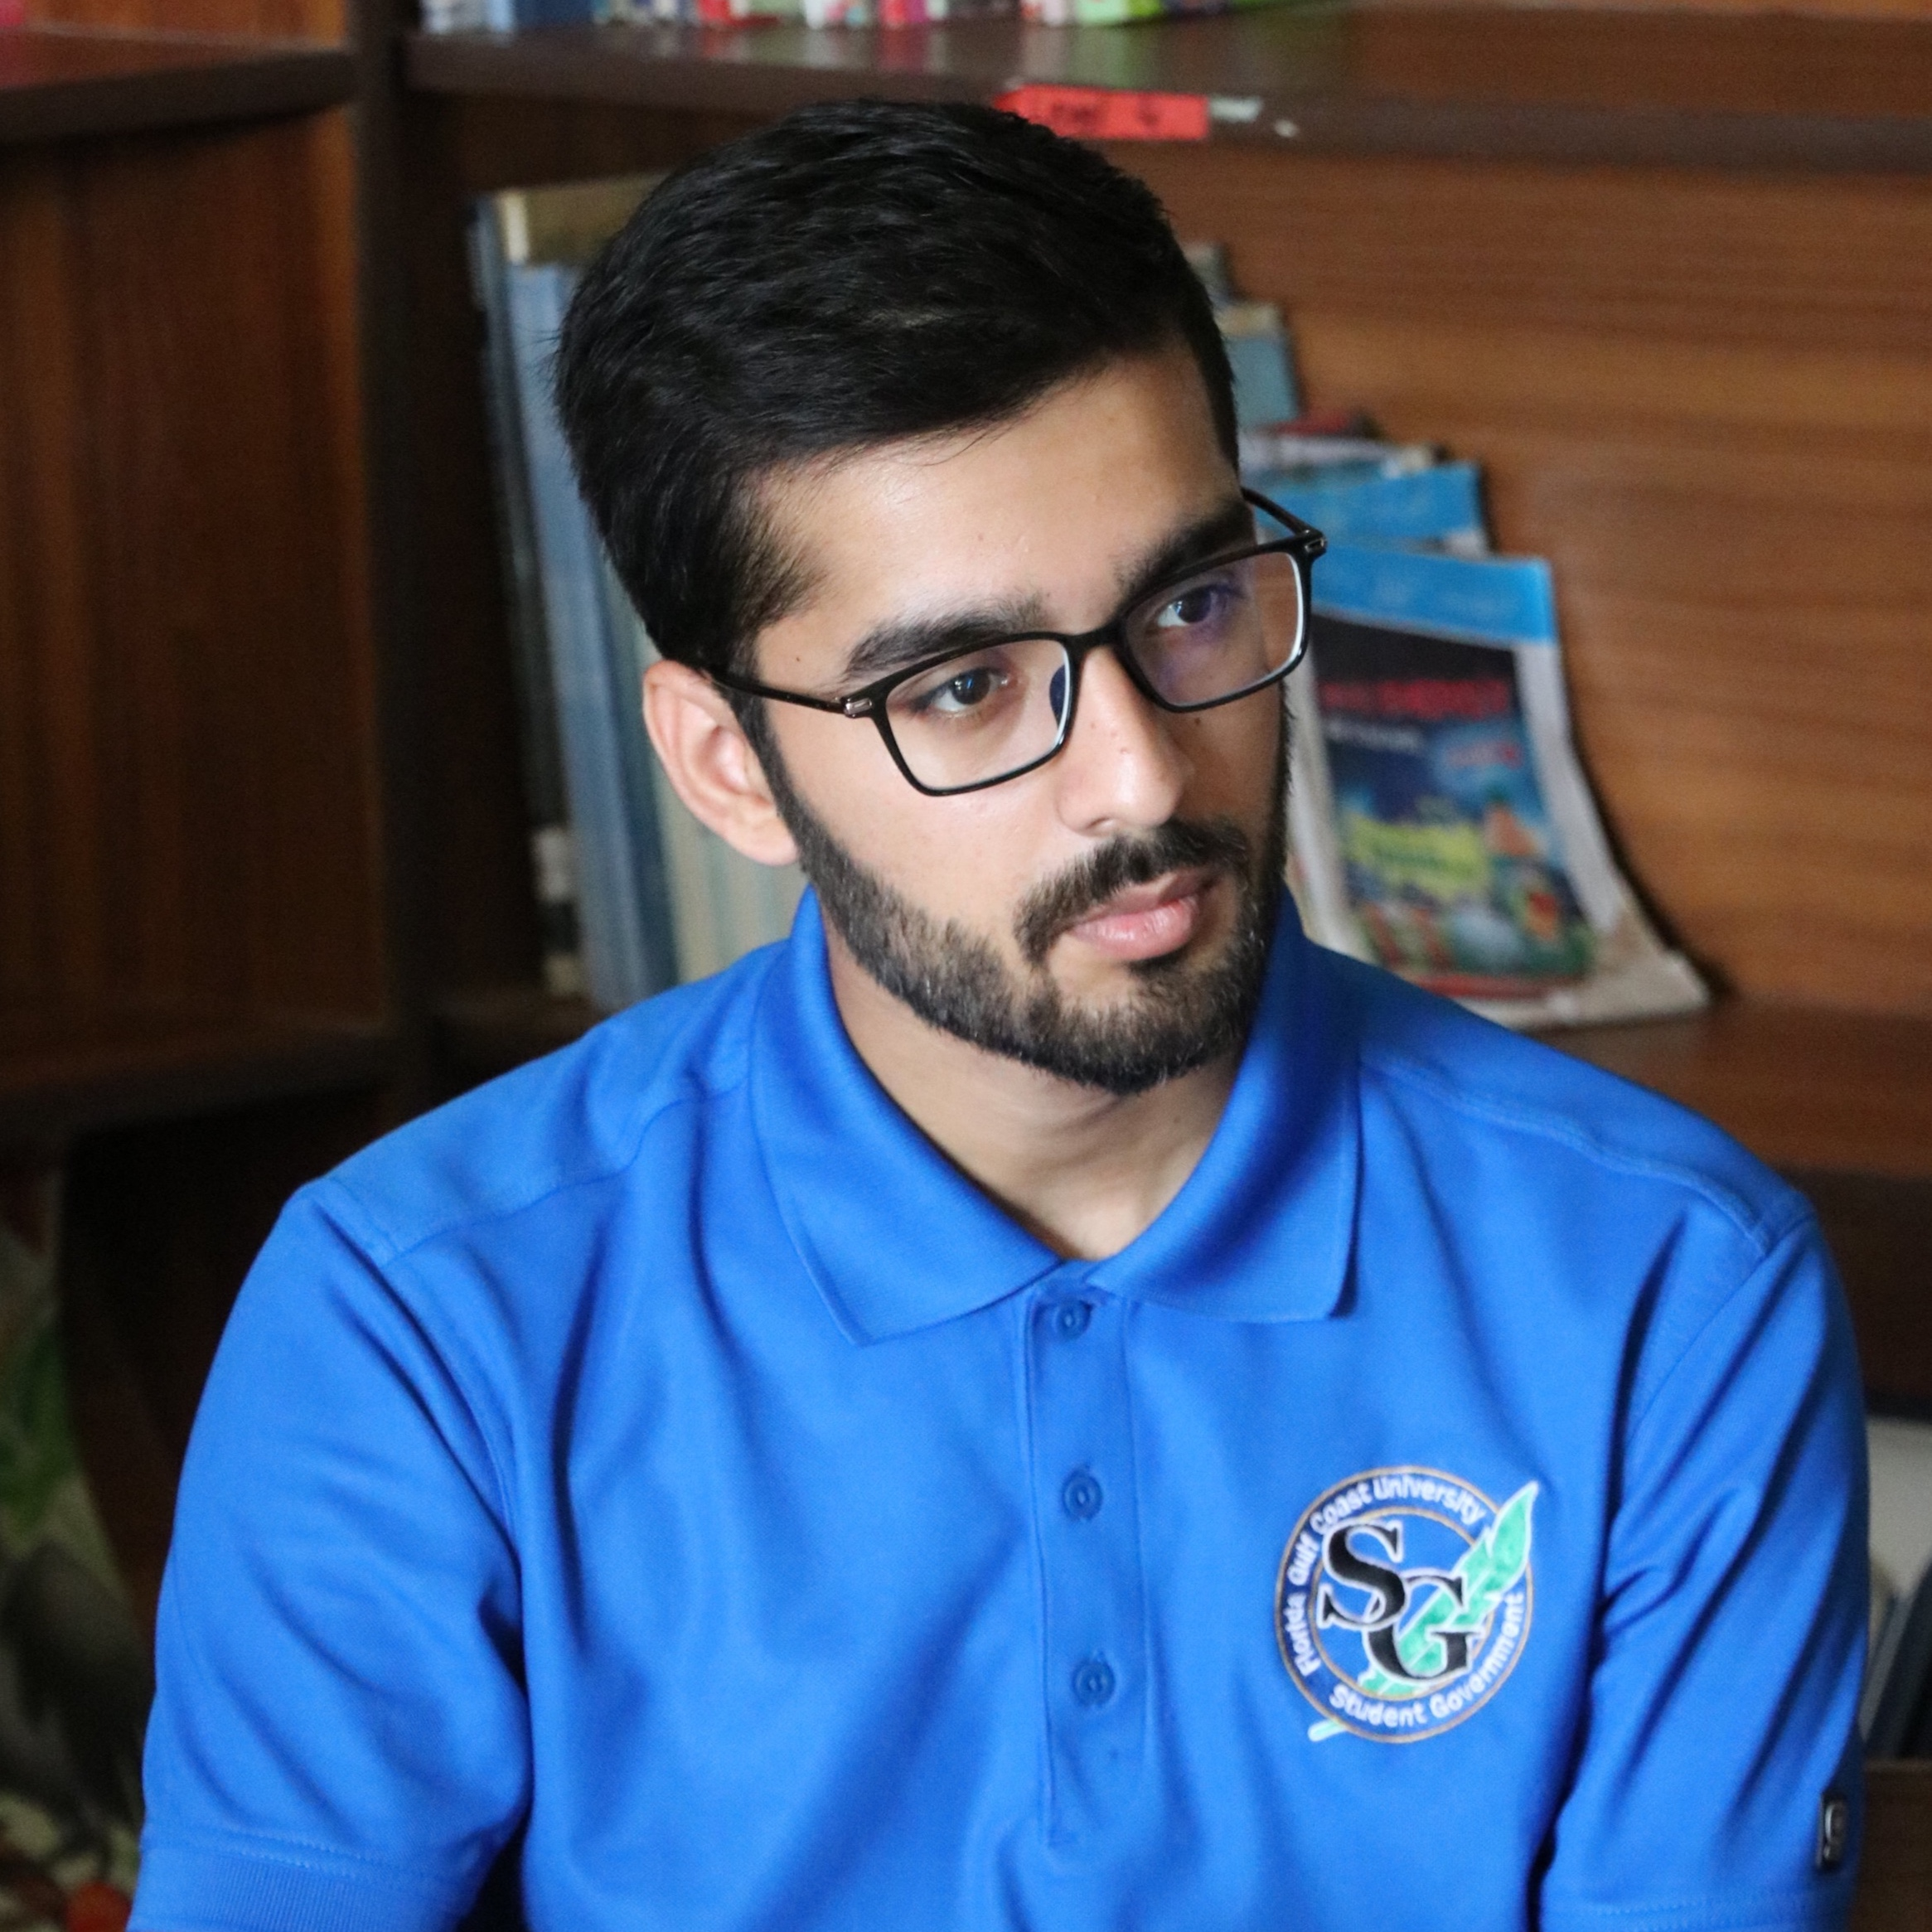 2018 APF Fellow Uzair Iqbal